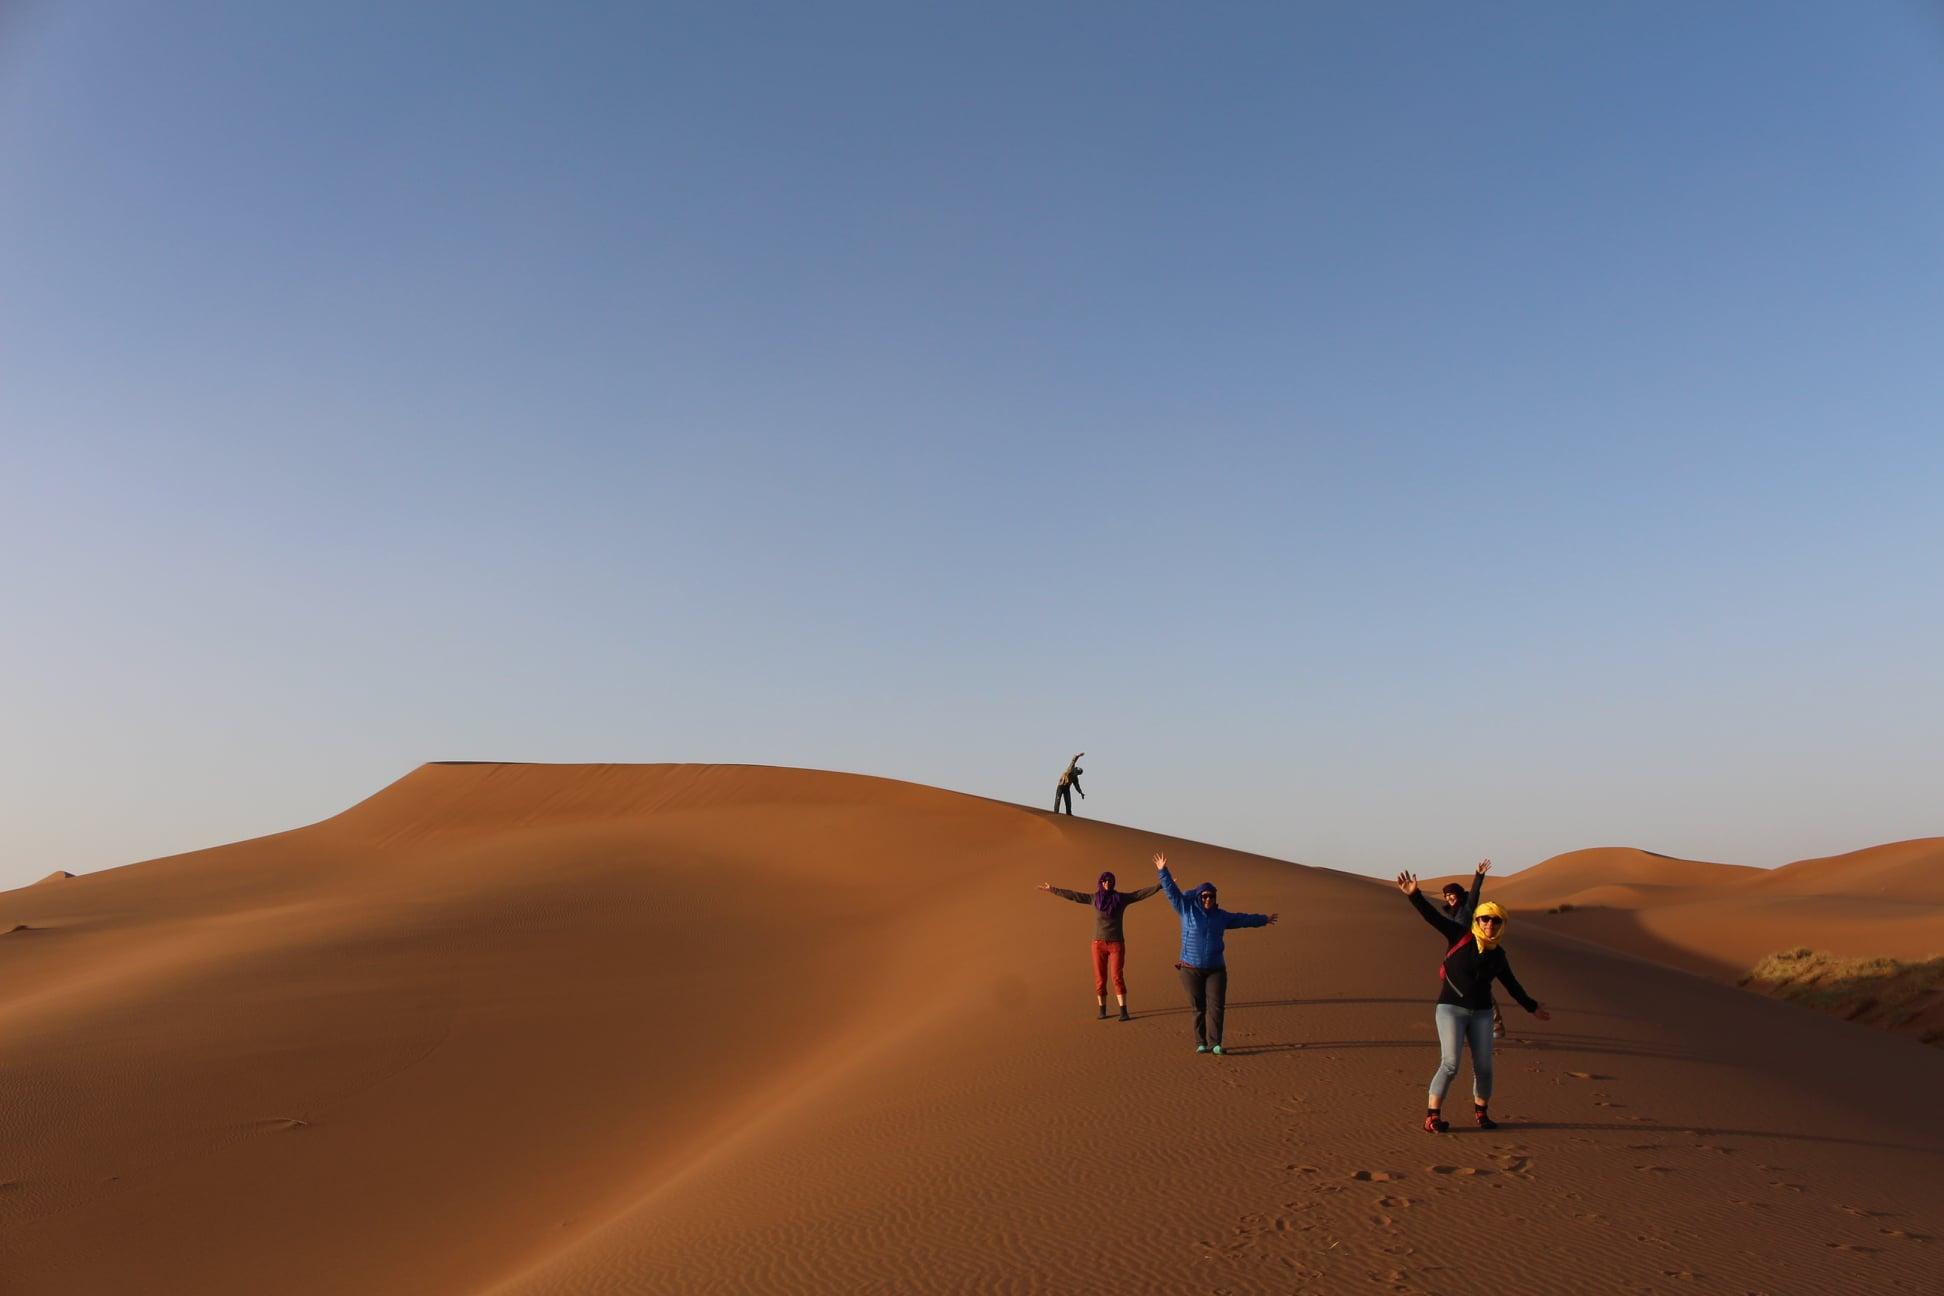 retraite spirituelle désert